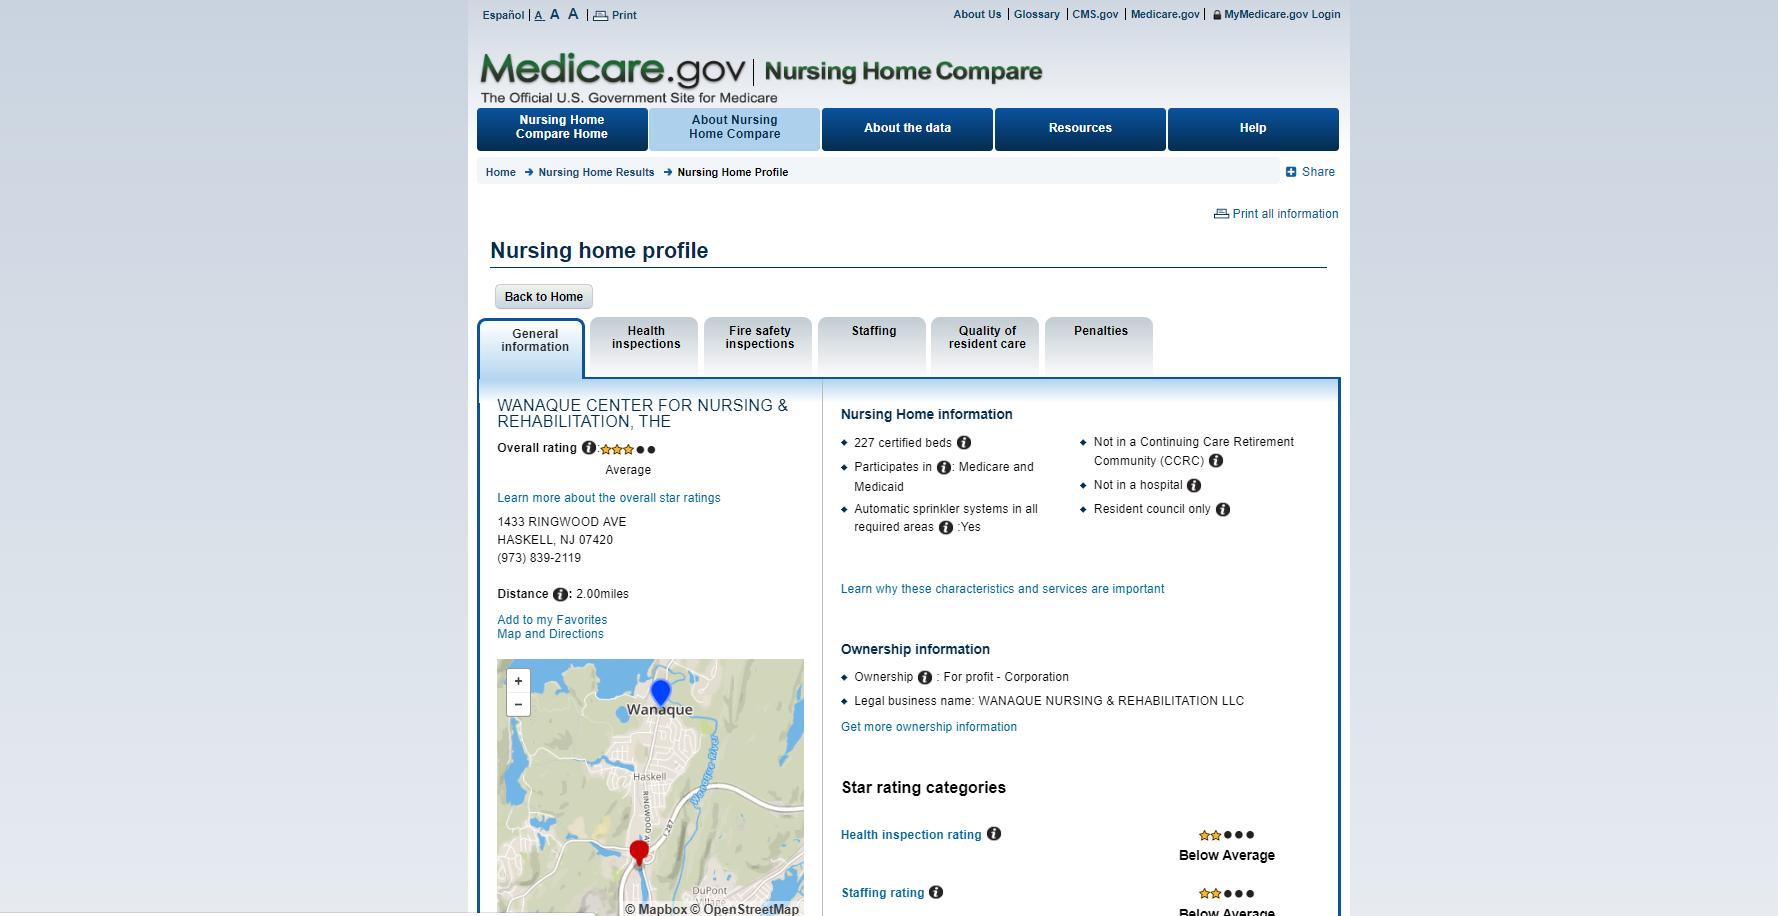 Medicare's Nursing Home Compare screenshot.  The Wanaque Center for Nursing and Rehabilitation has a 3-star rating on Medicare's Nursing Home Compare web site, March 22, 2019.